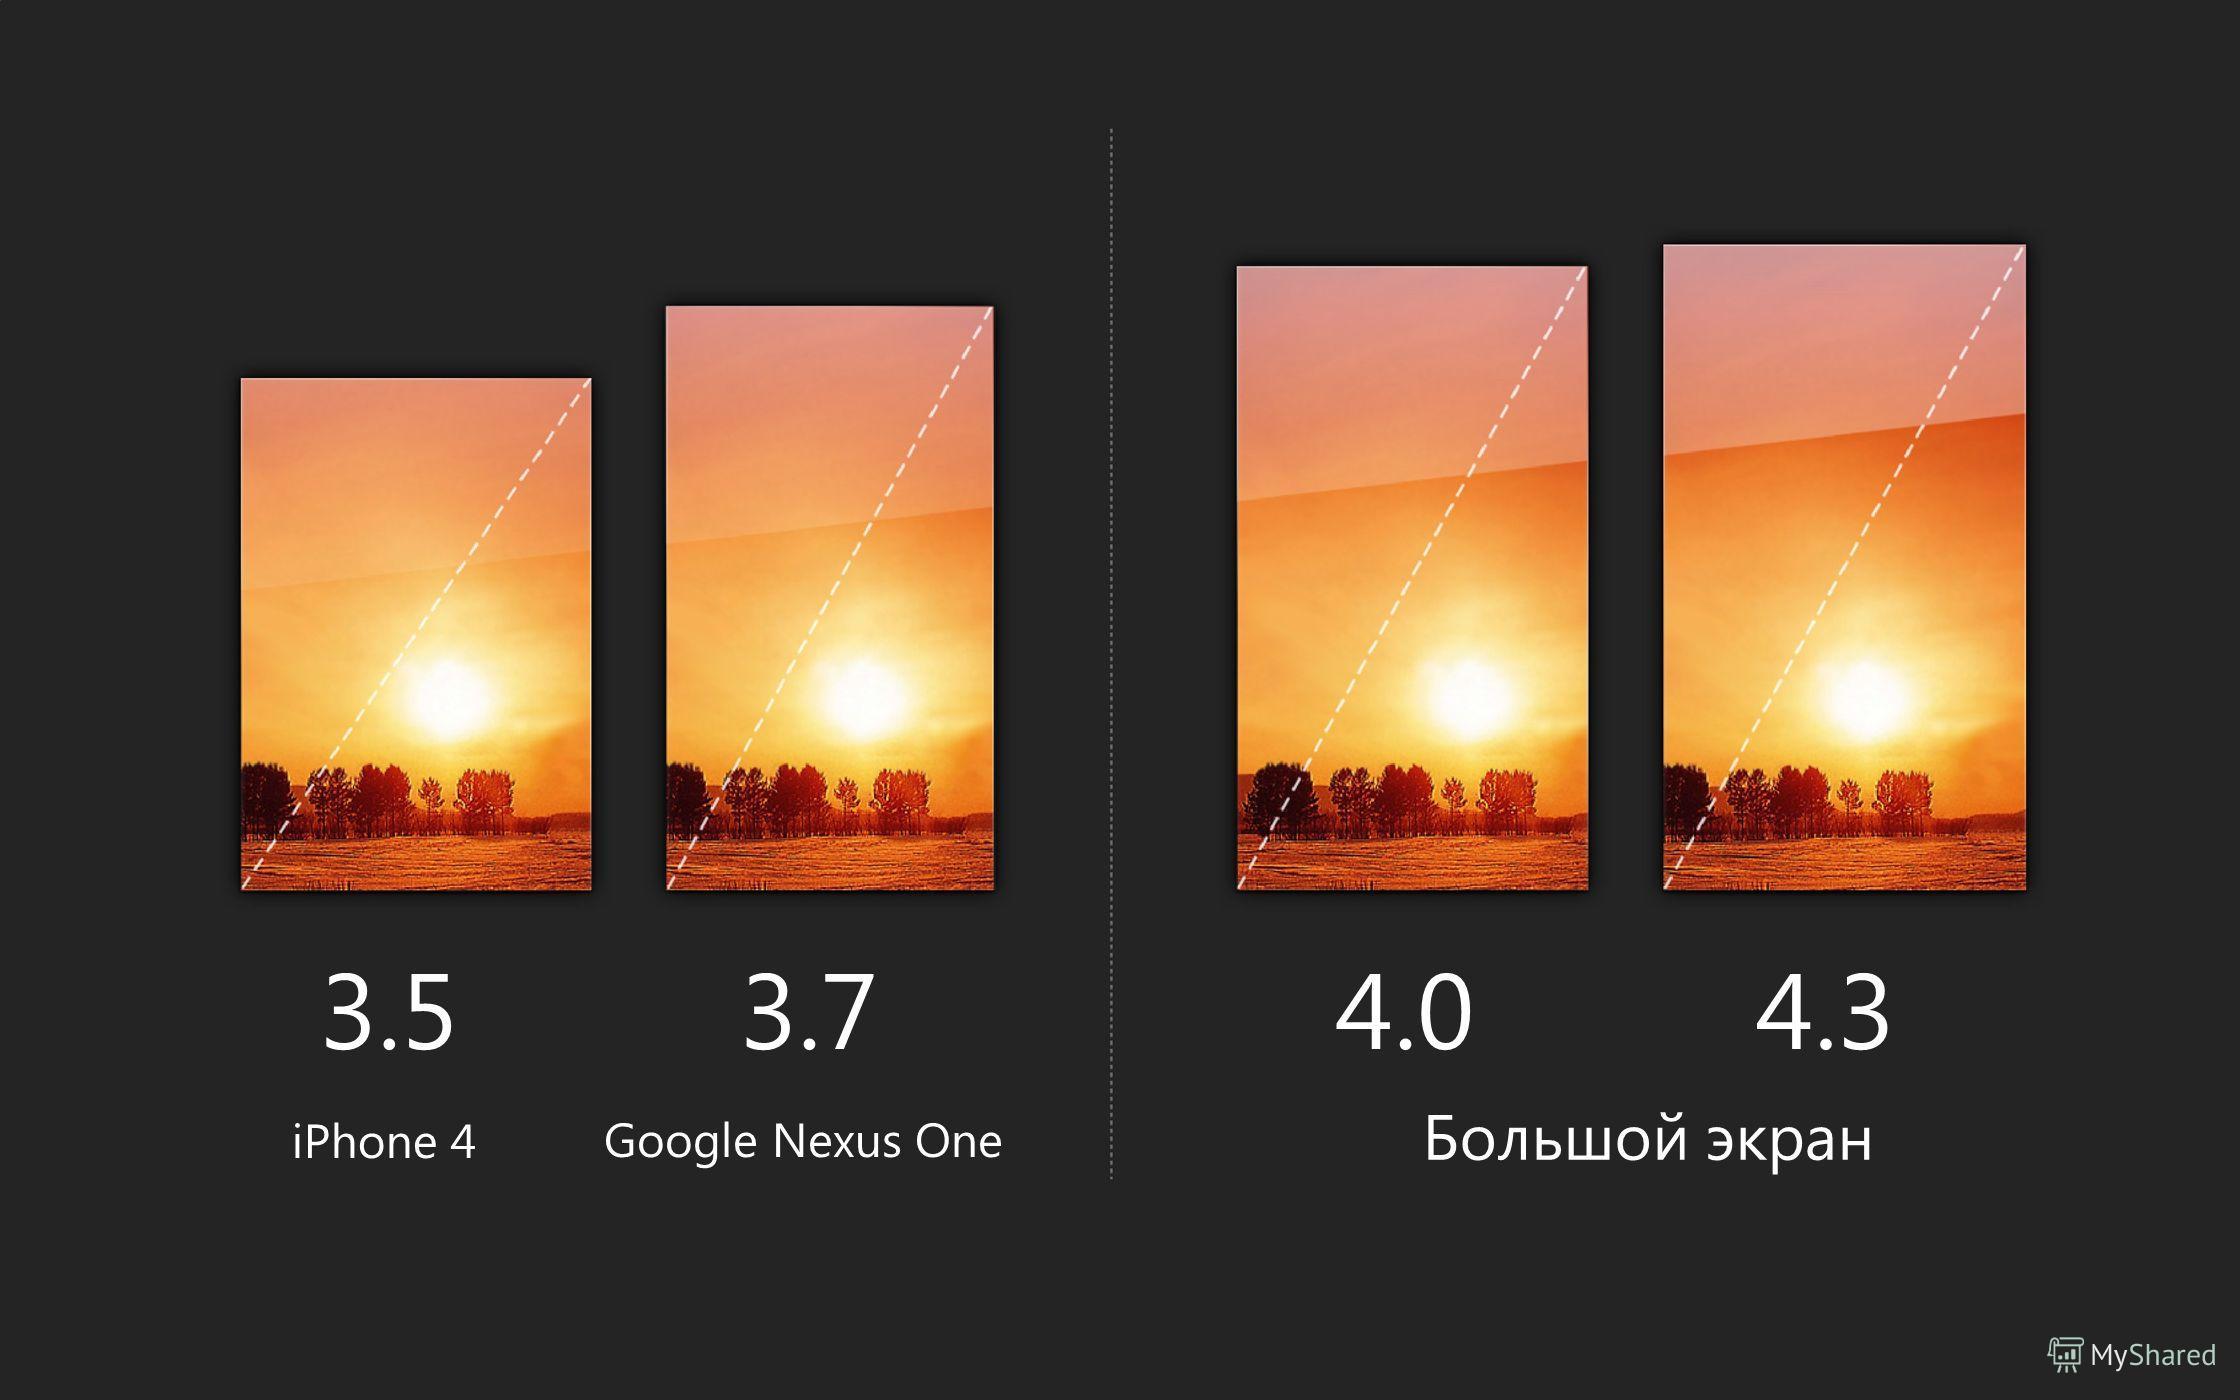 3.5 iPhone 4 3.7 Google Nexus One 4.0 Большой экран 4.3